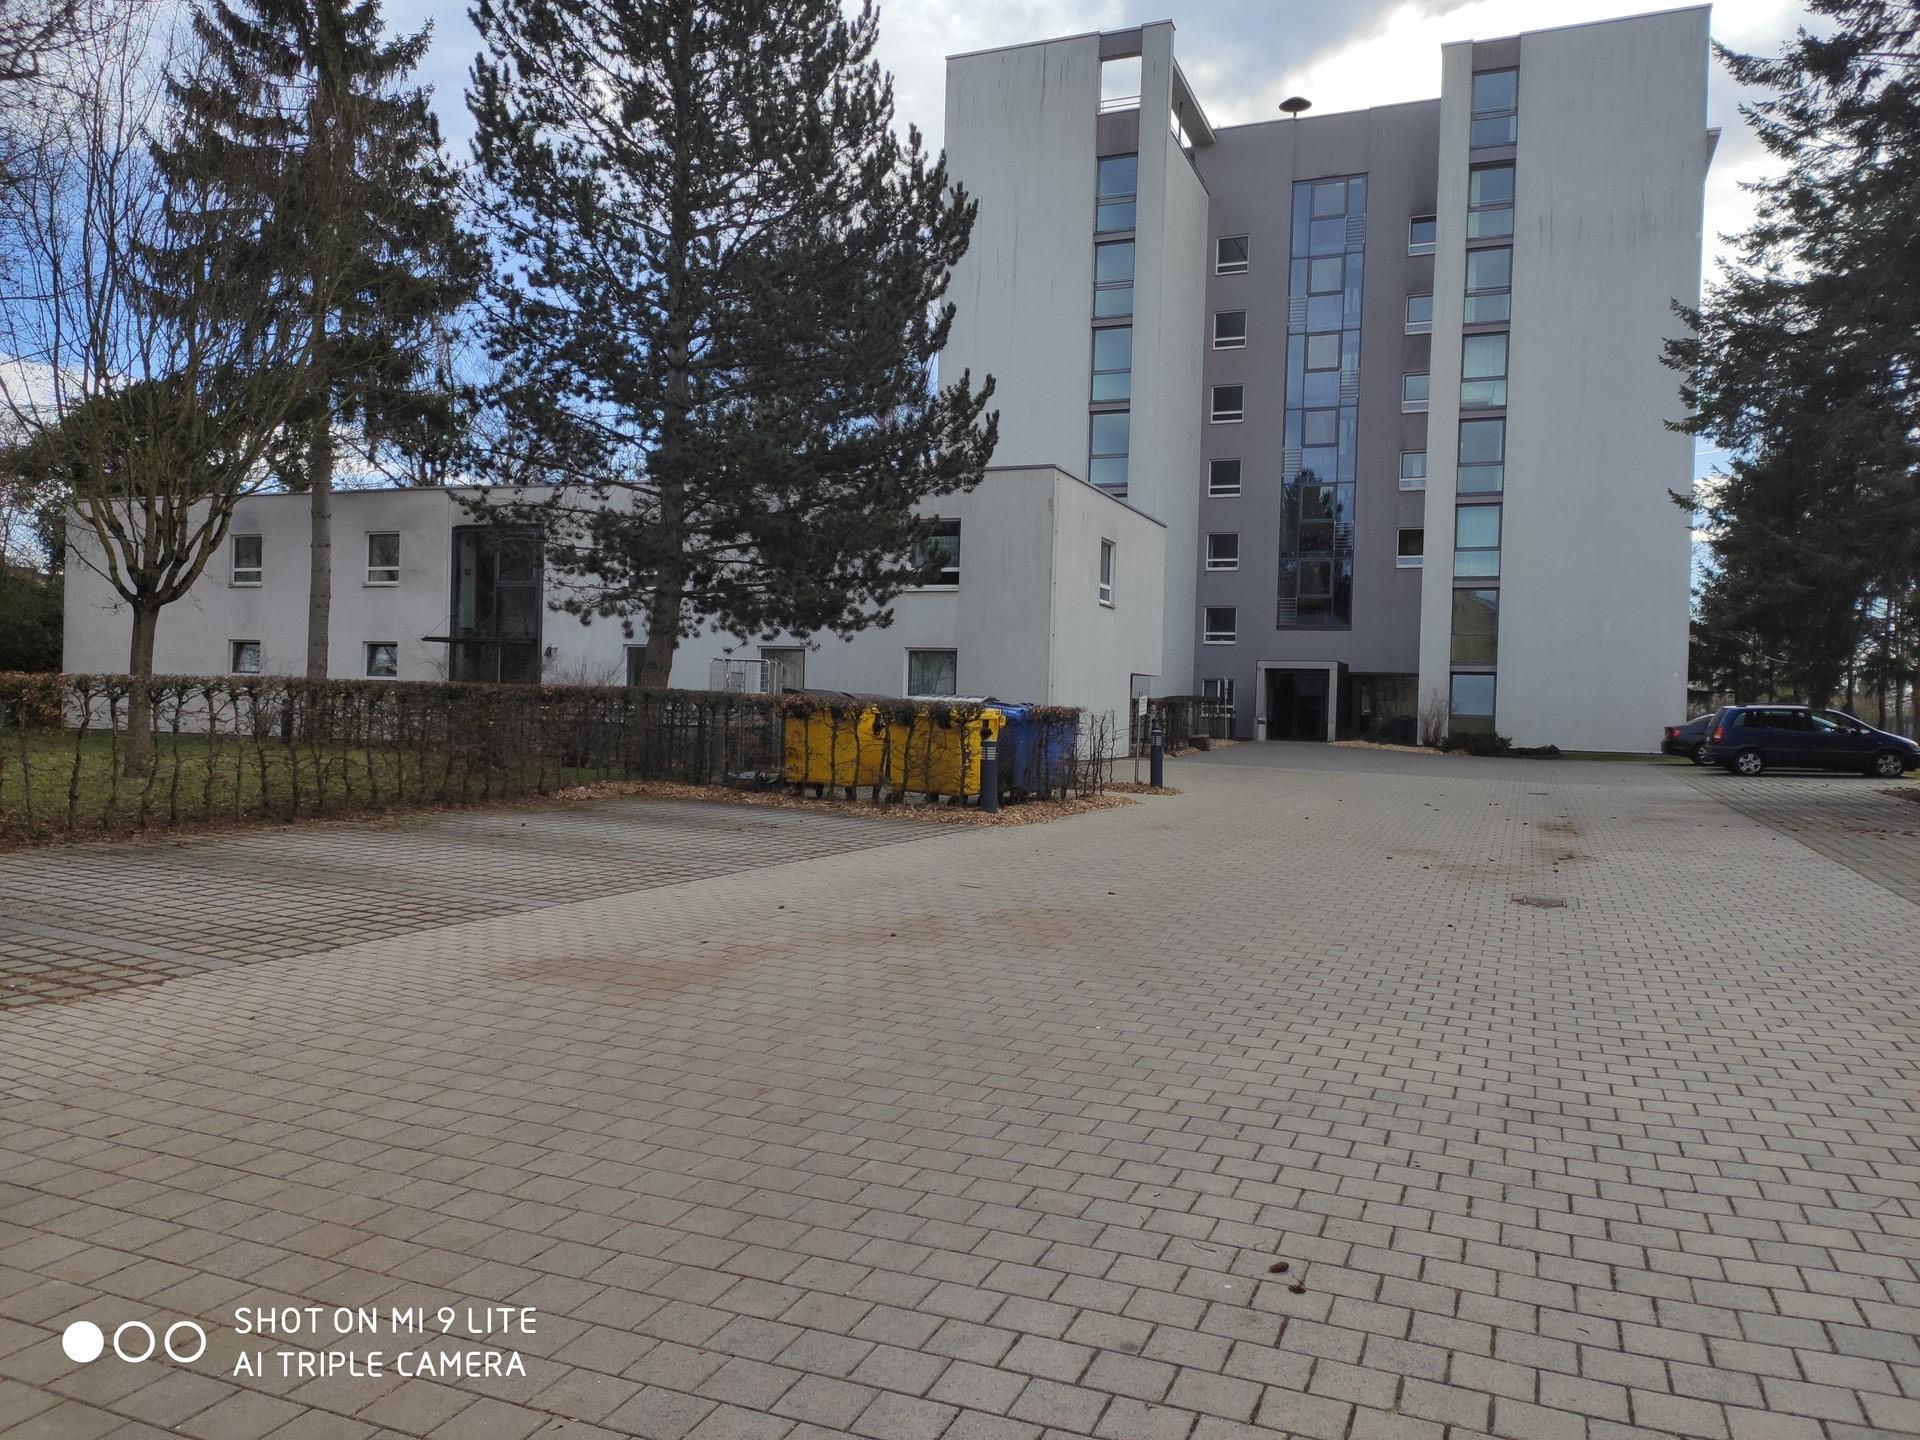 My experience in Schweinfurt